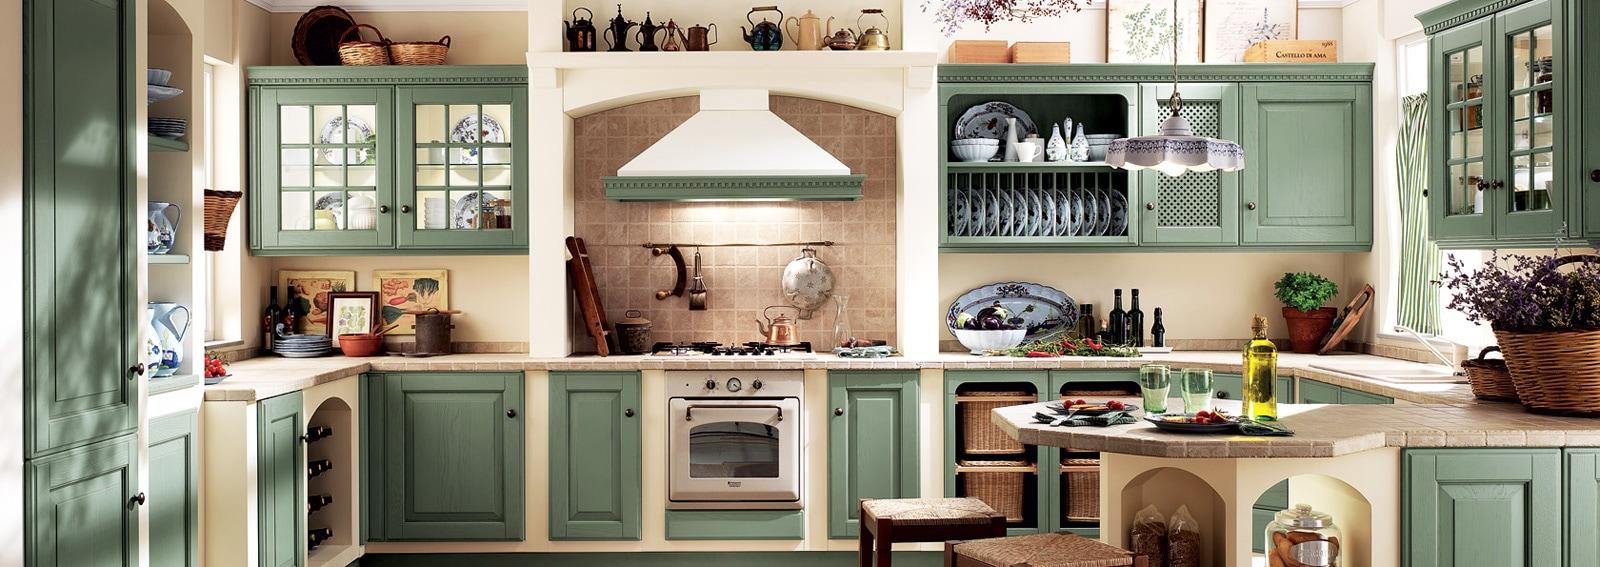 Cucine in muratura classiche rustiche e country - Cucine country immagini ...